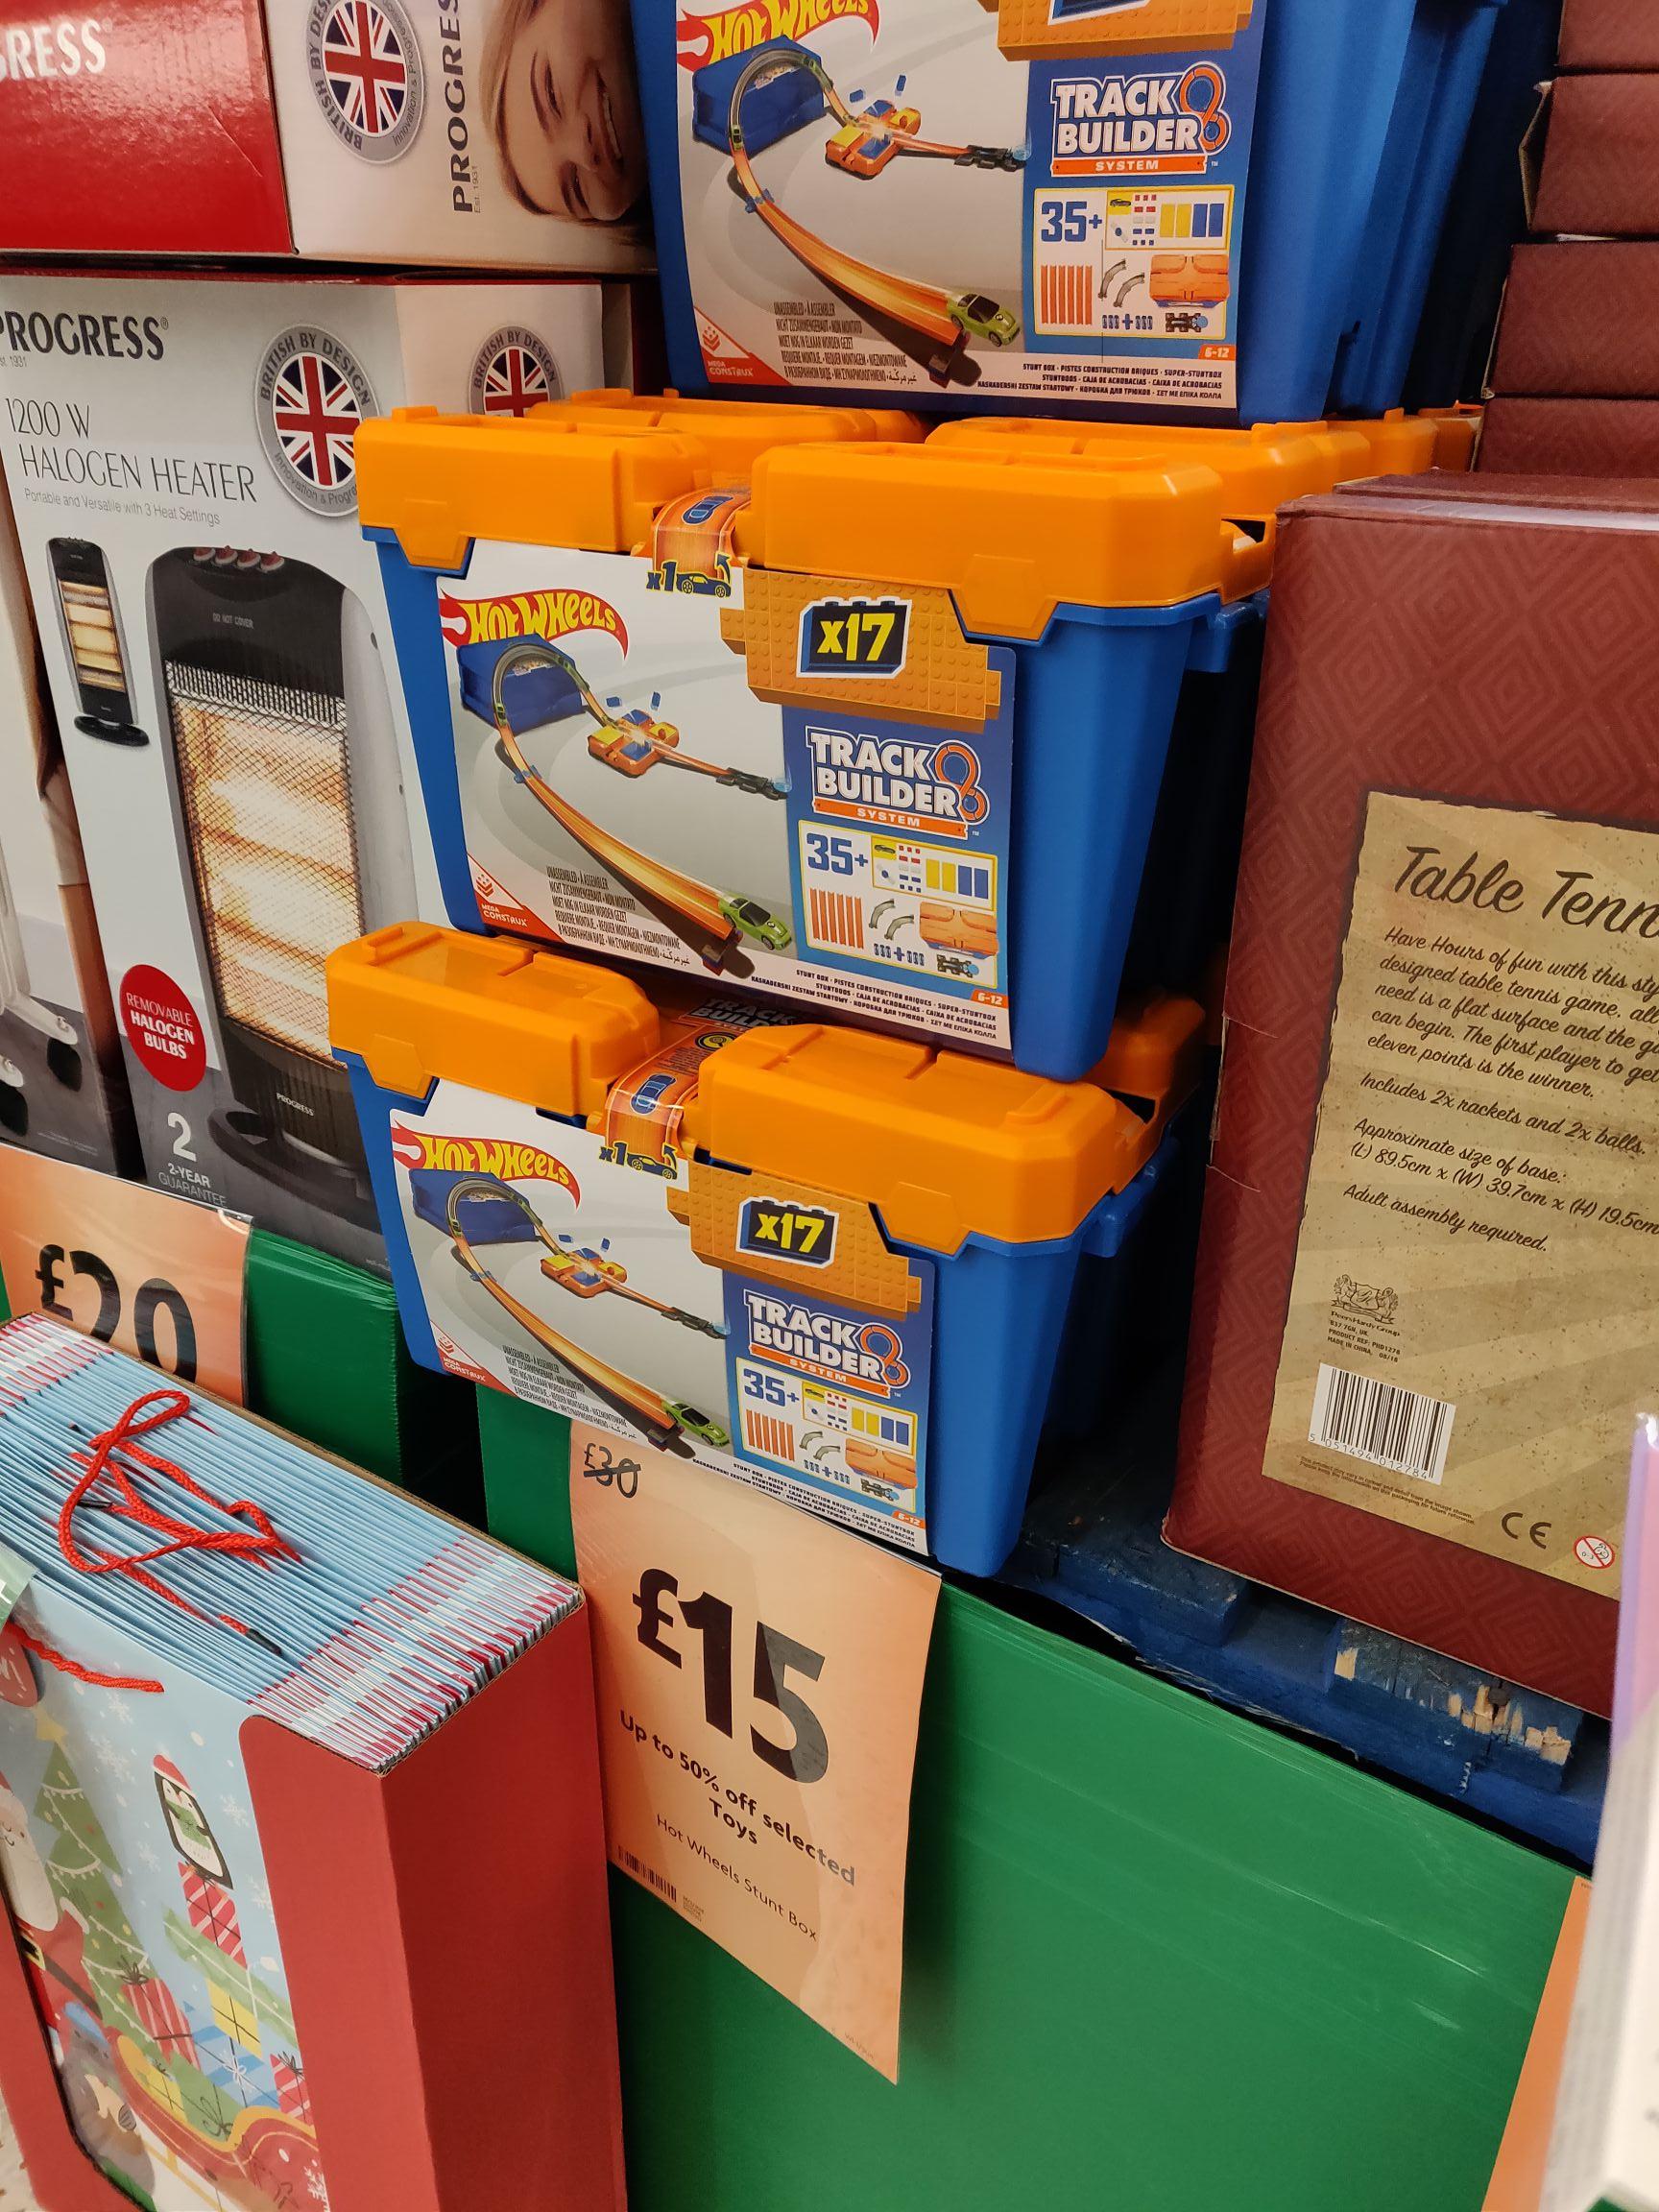 Hot Wheels Track Builder System Stunt Box £7.50 Morrisons instore